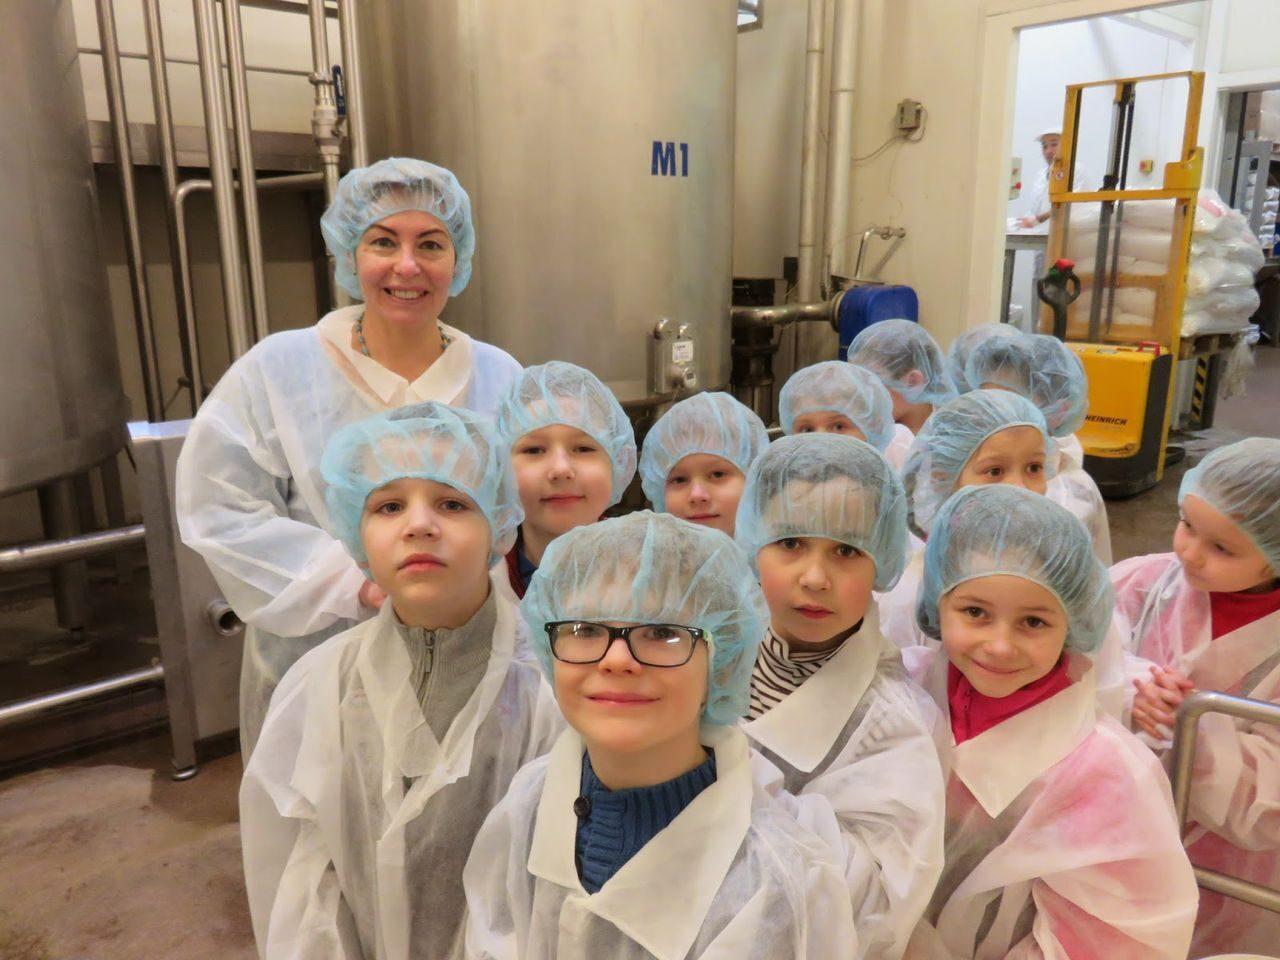 фабрика мороженого экскурсия фото